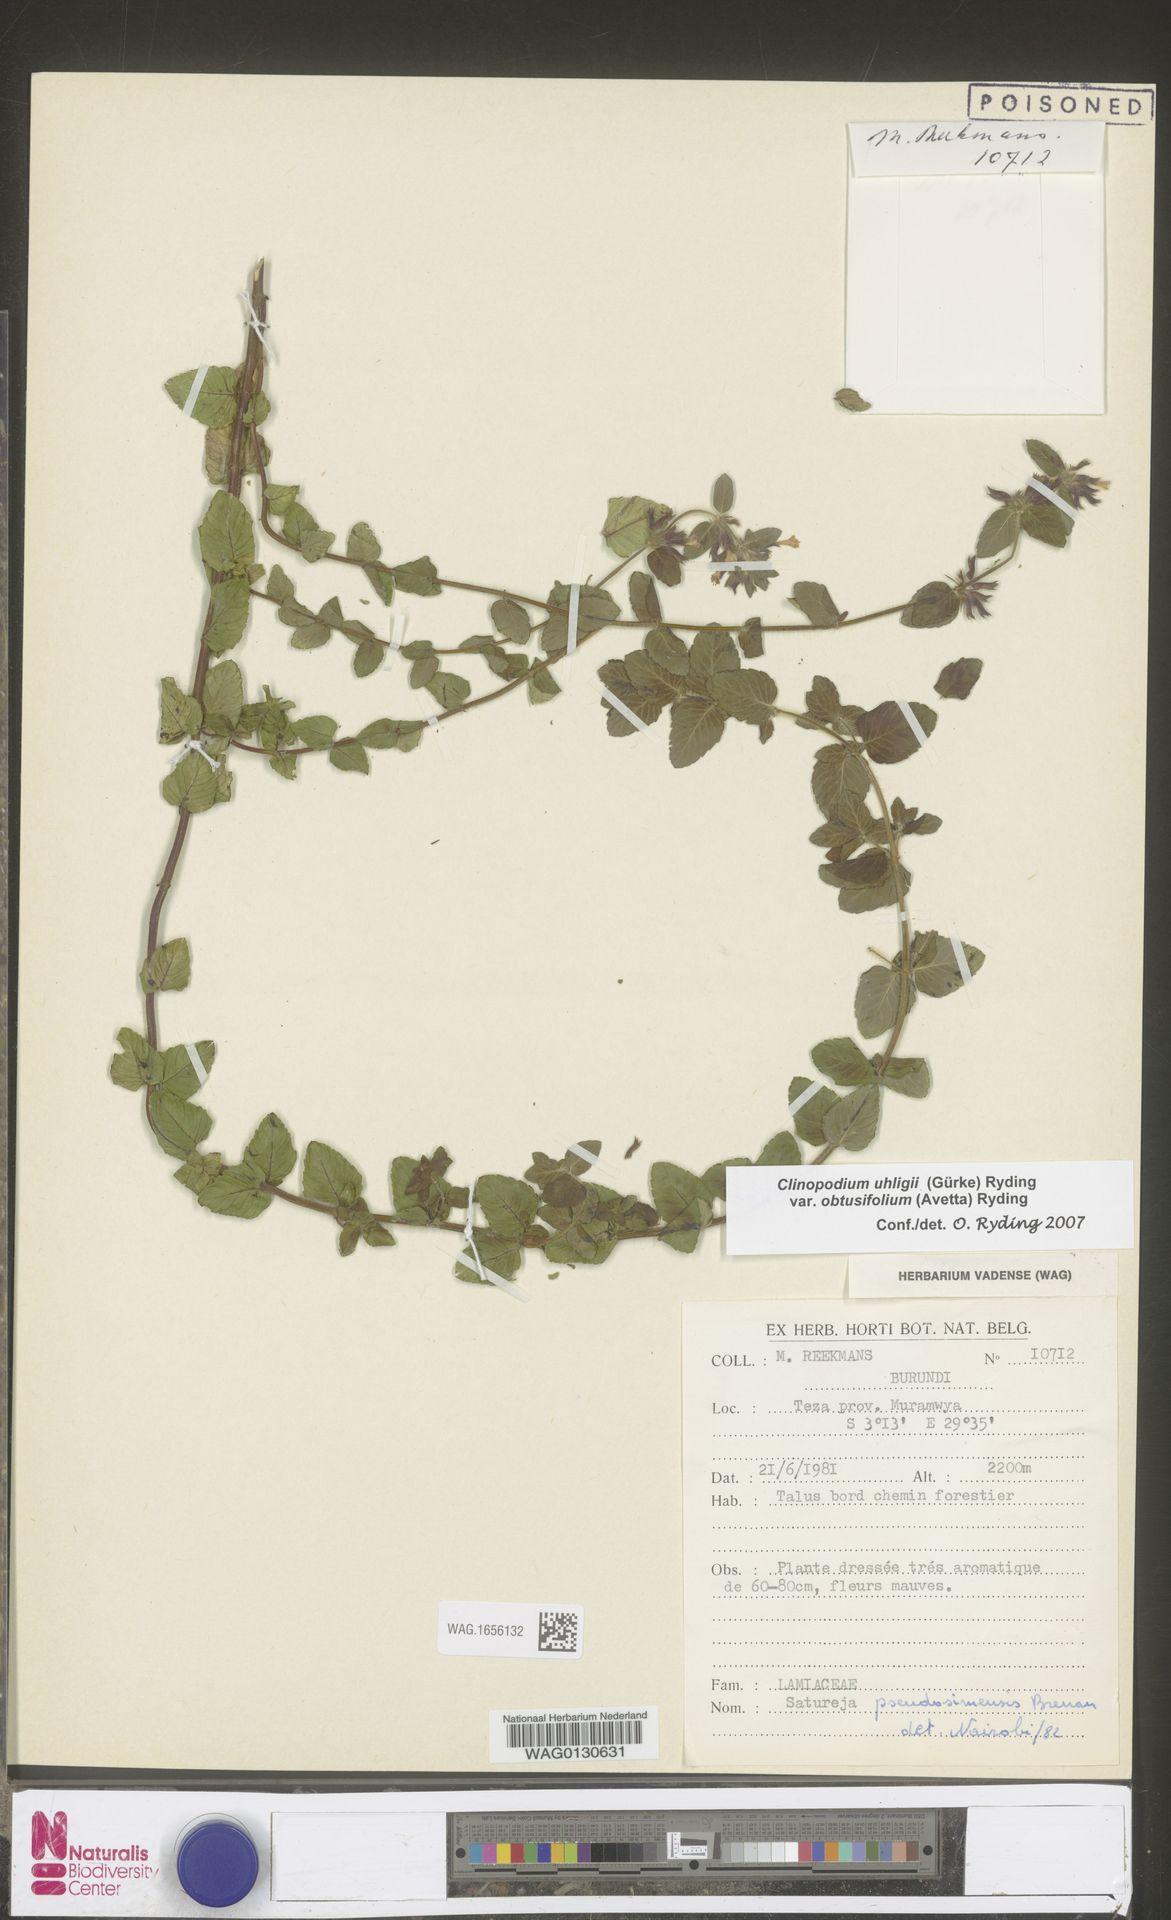 WAG.1656132 | Clinopodium uhligii var. obtusifolium (Avetta) Ryding